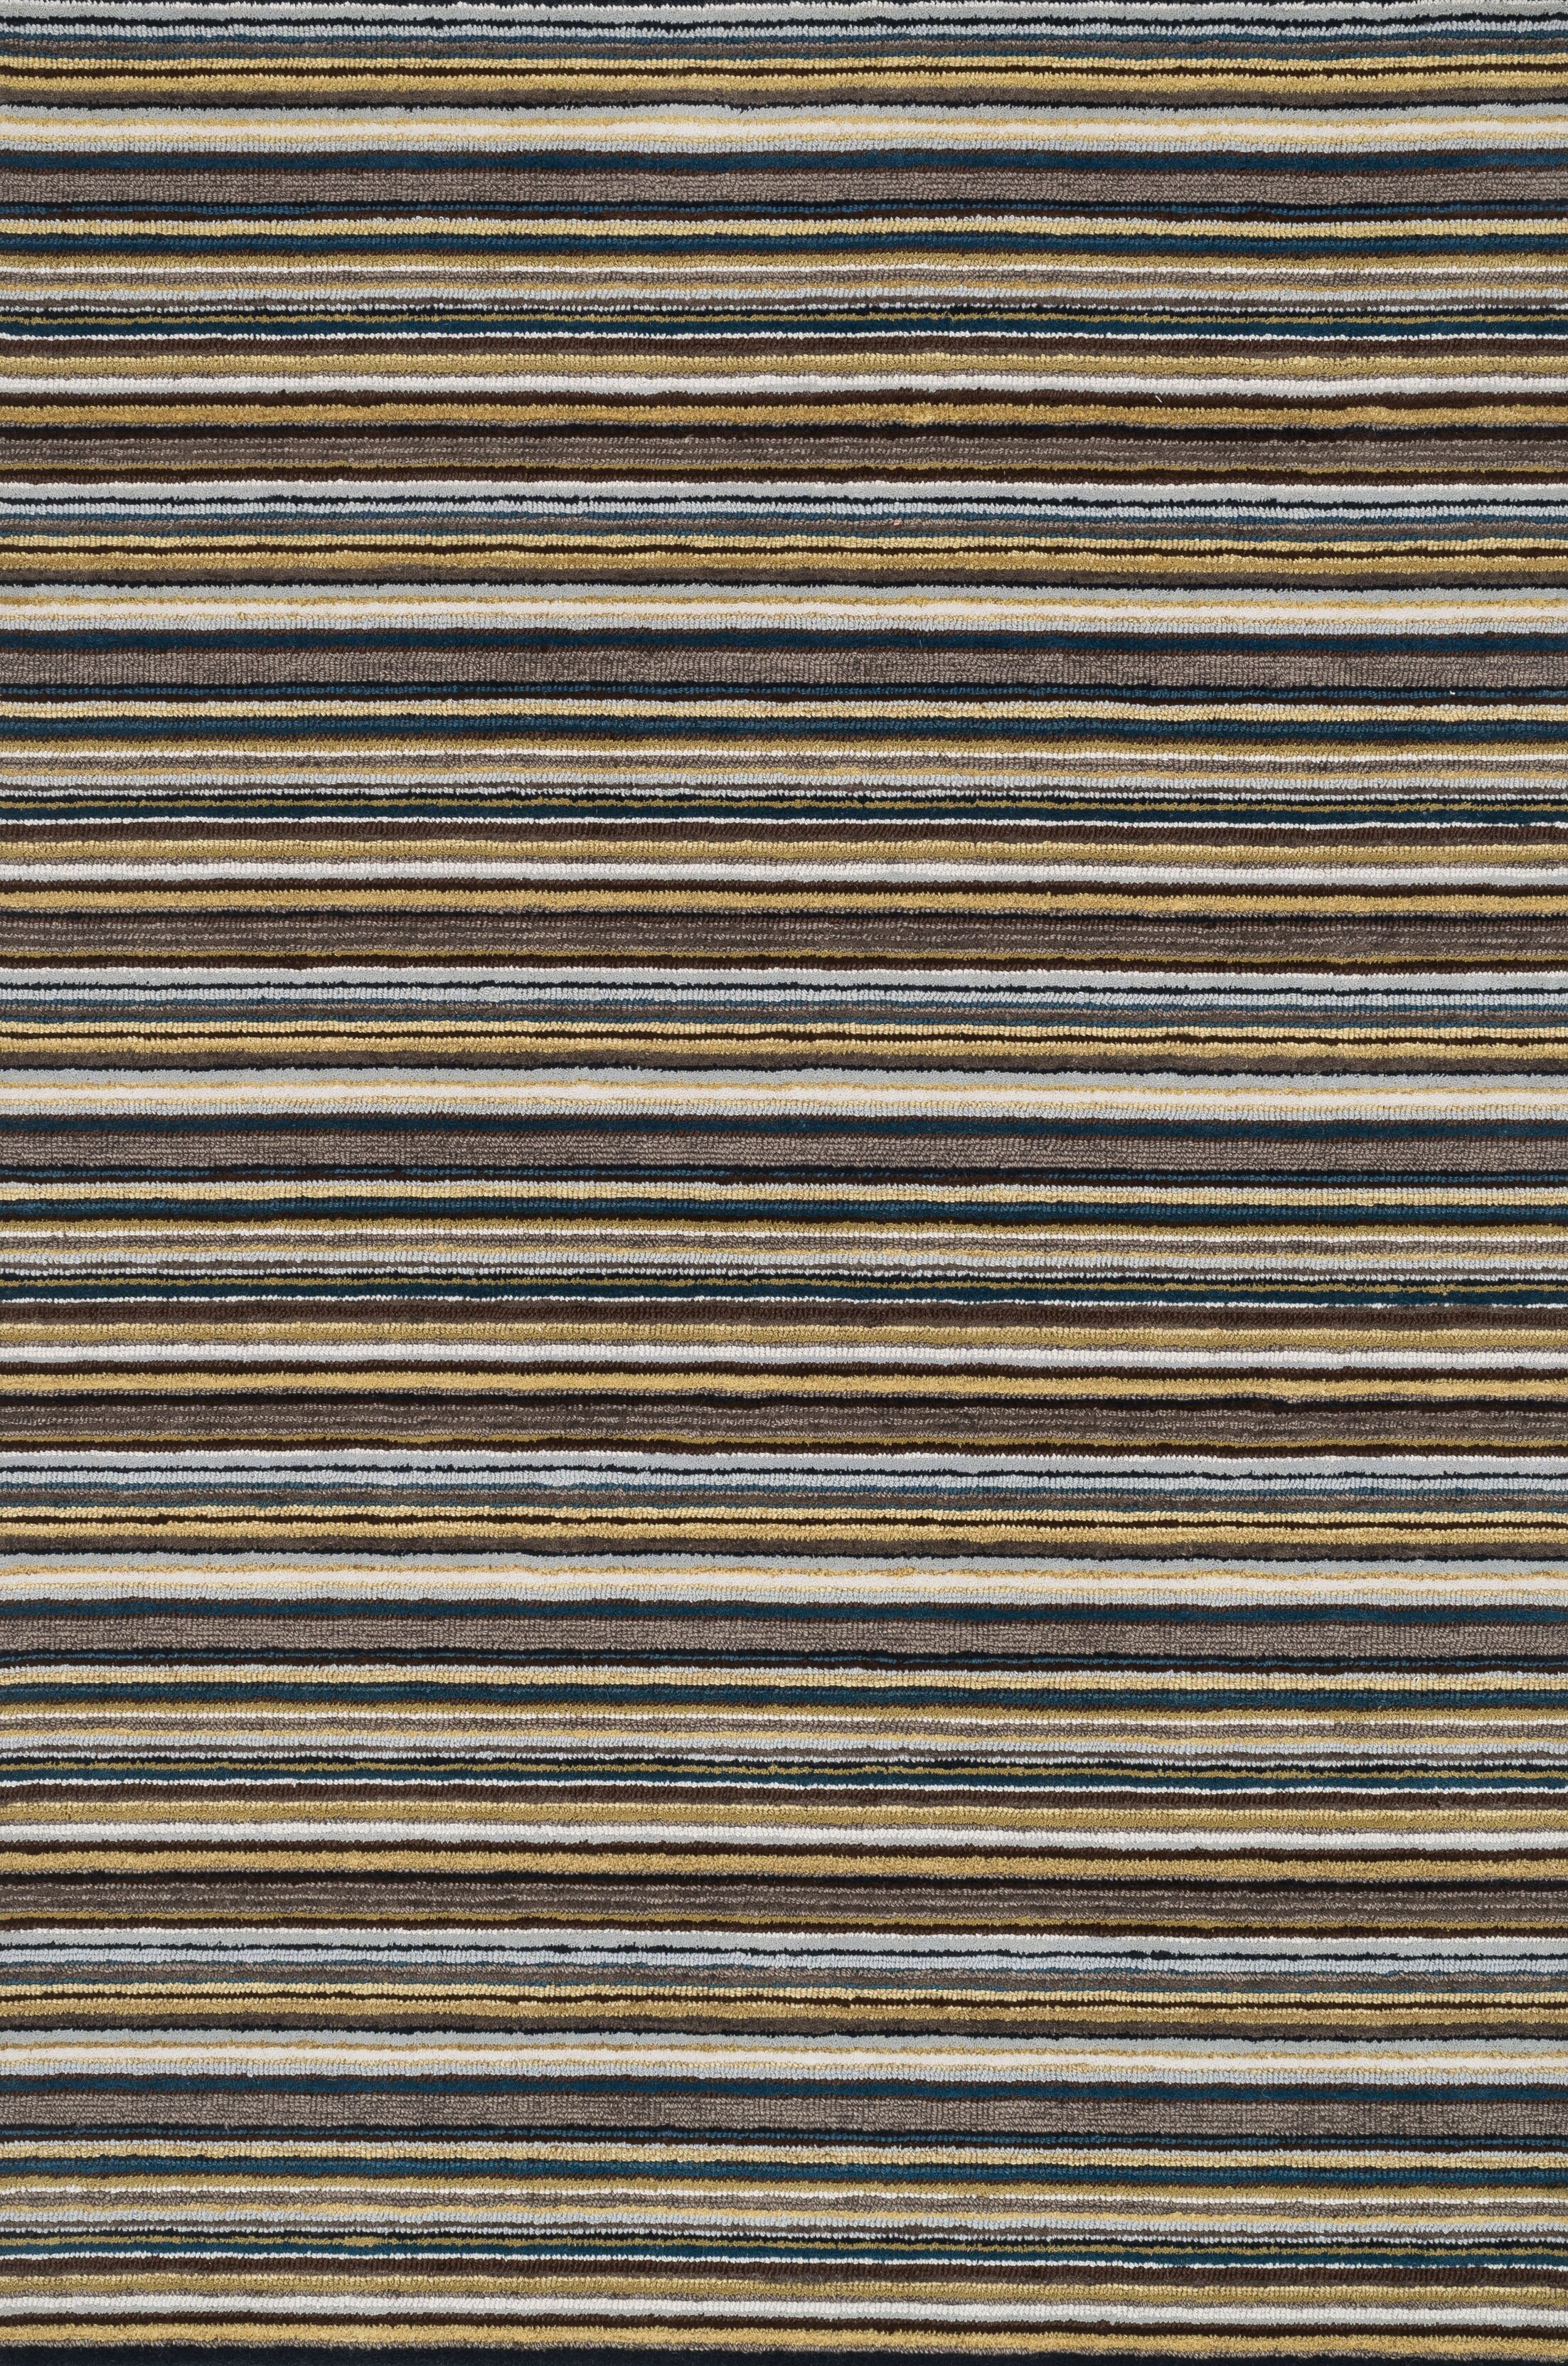 Kirksey Hand-Tufted Gray Area Rug Rug Size: Rectangle 3'6